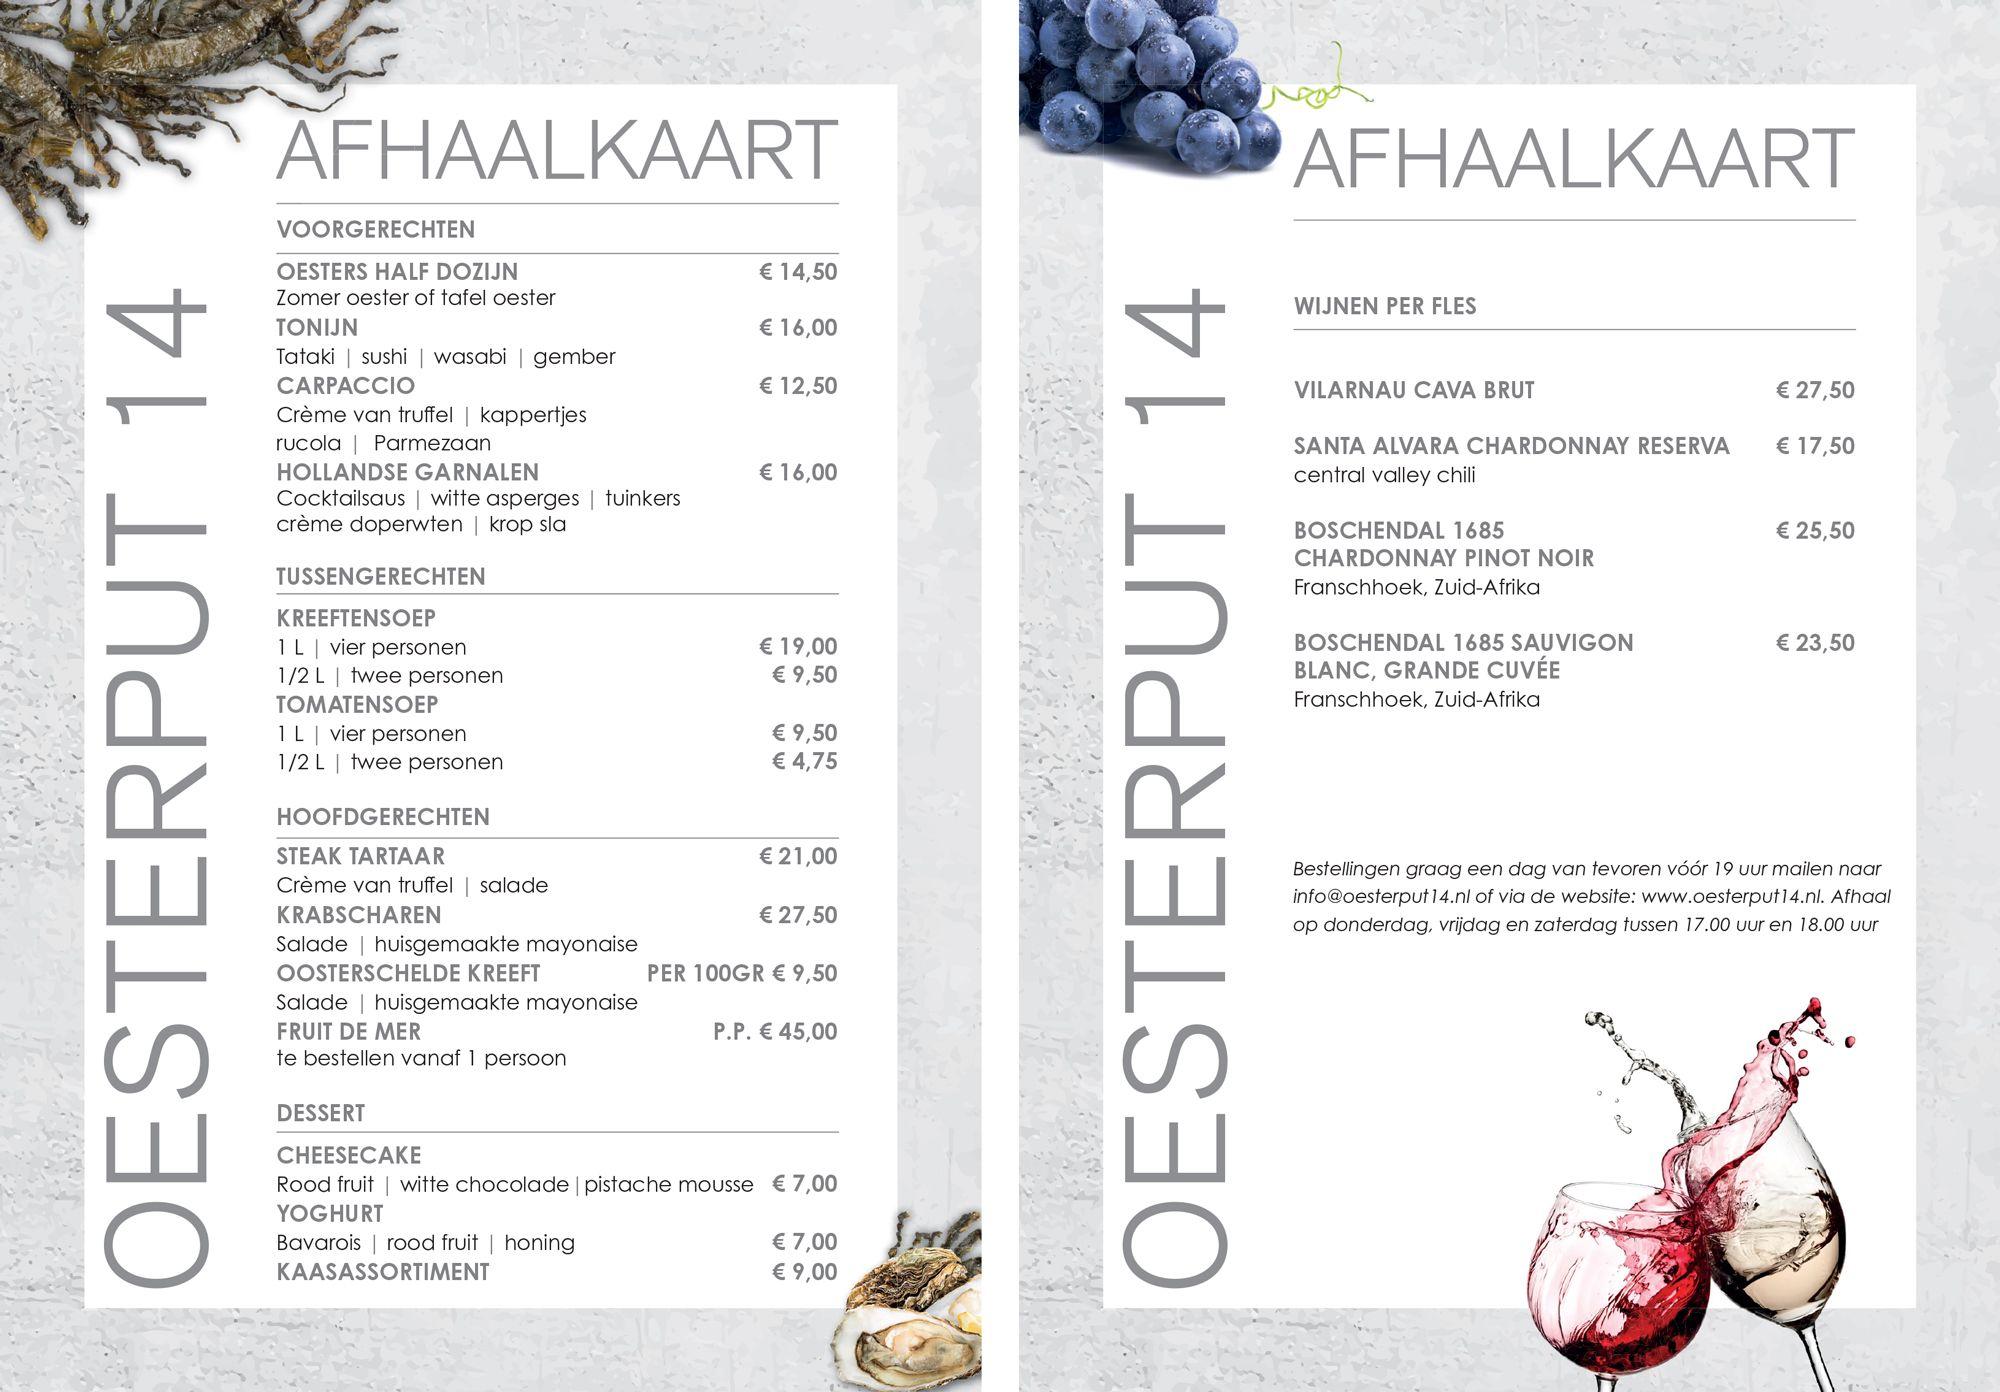 Afhaalkaart_Oesterput-(4)-1